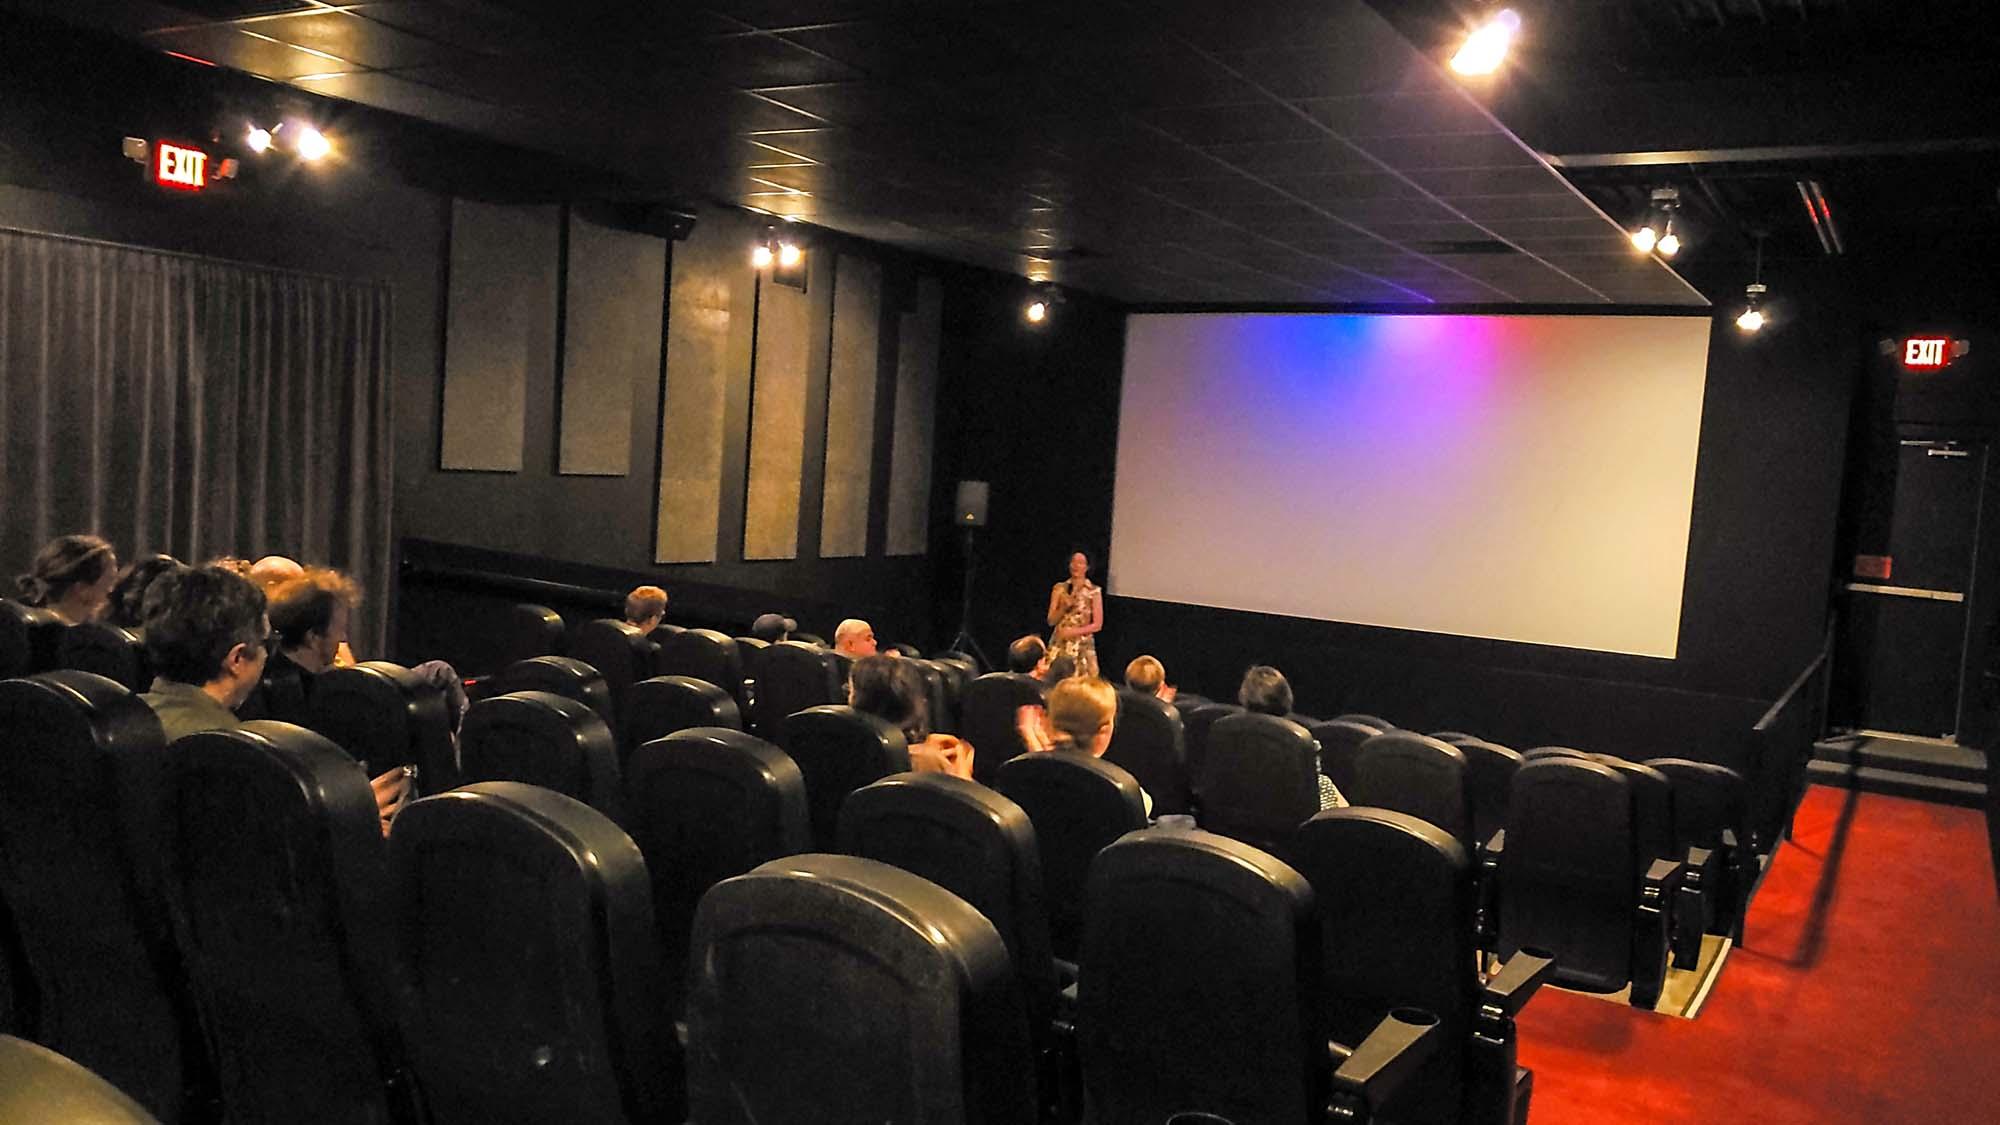 movie theatre interior with people